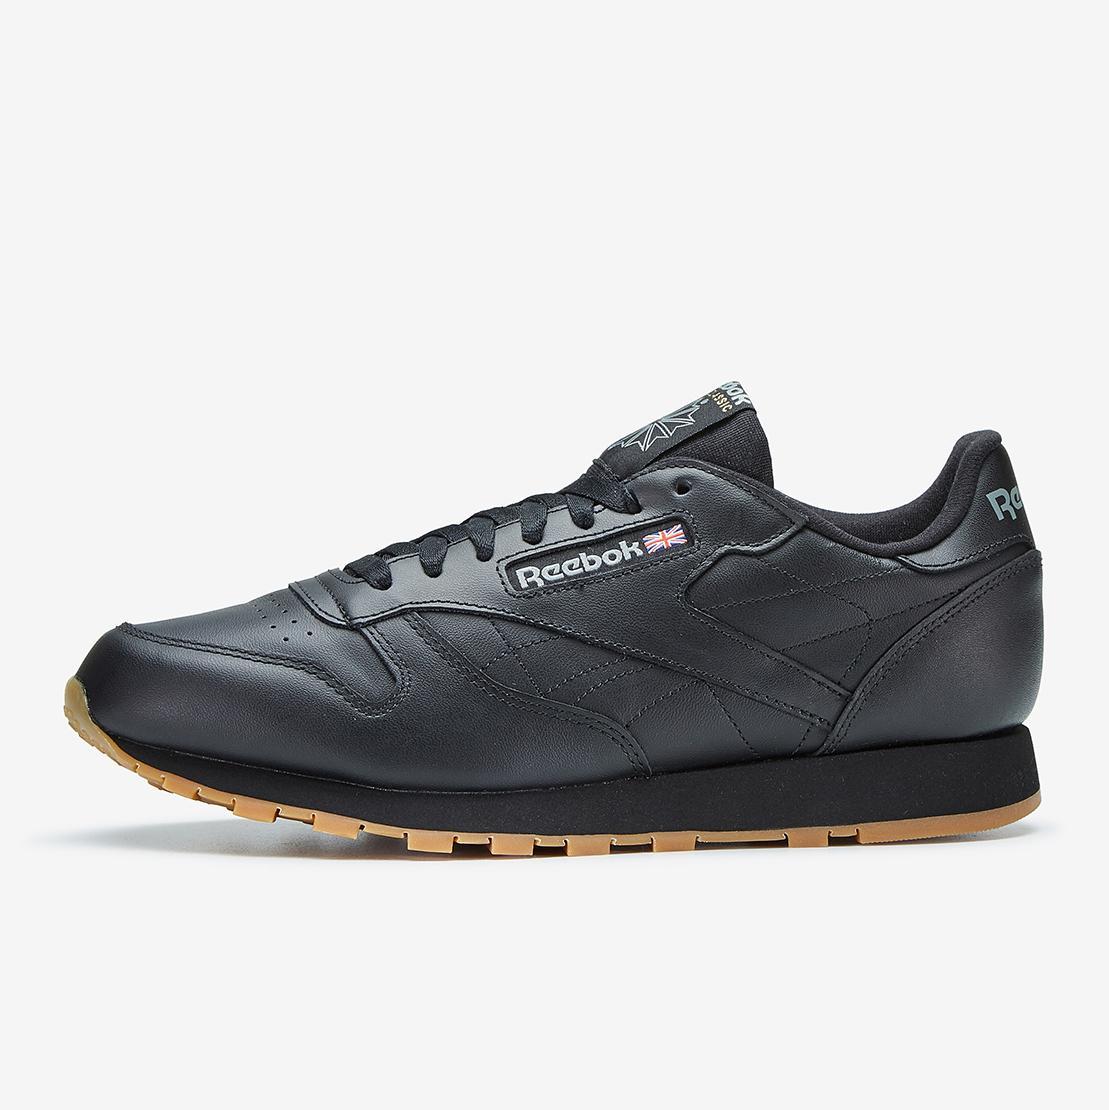 Men's Classic Leather